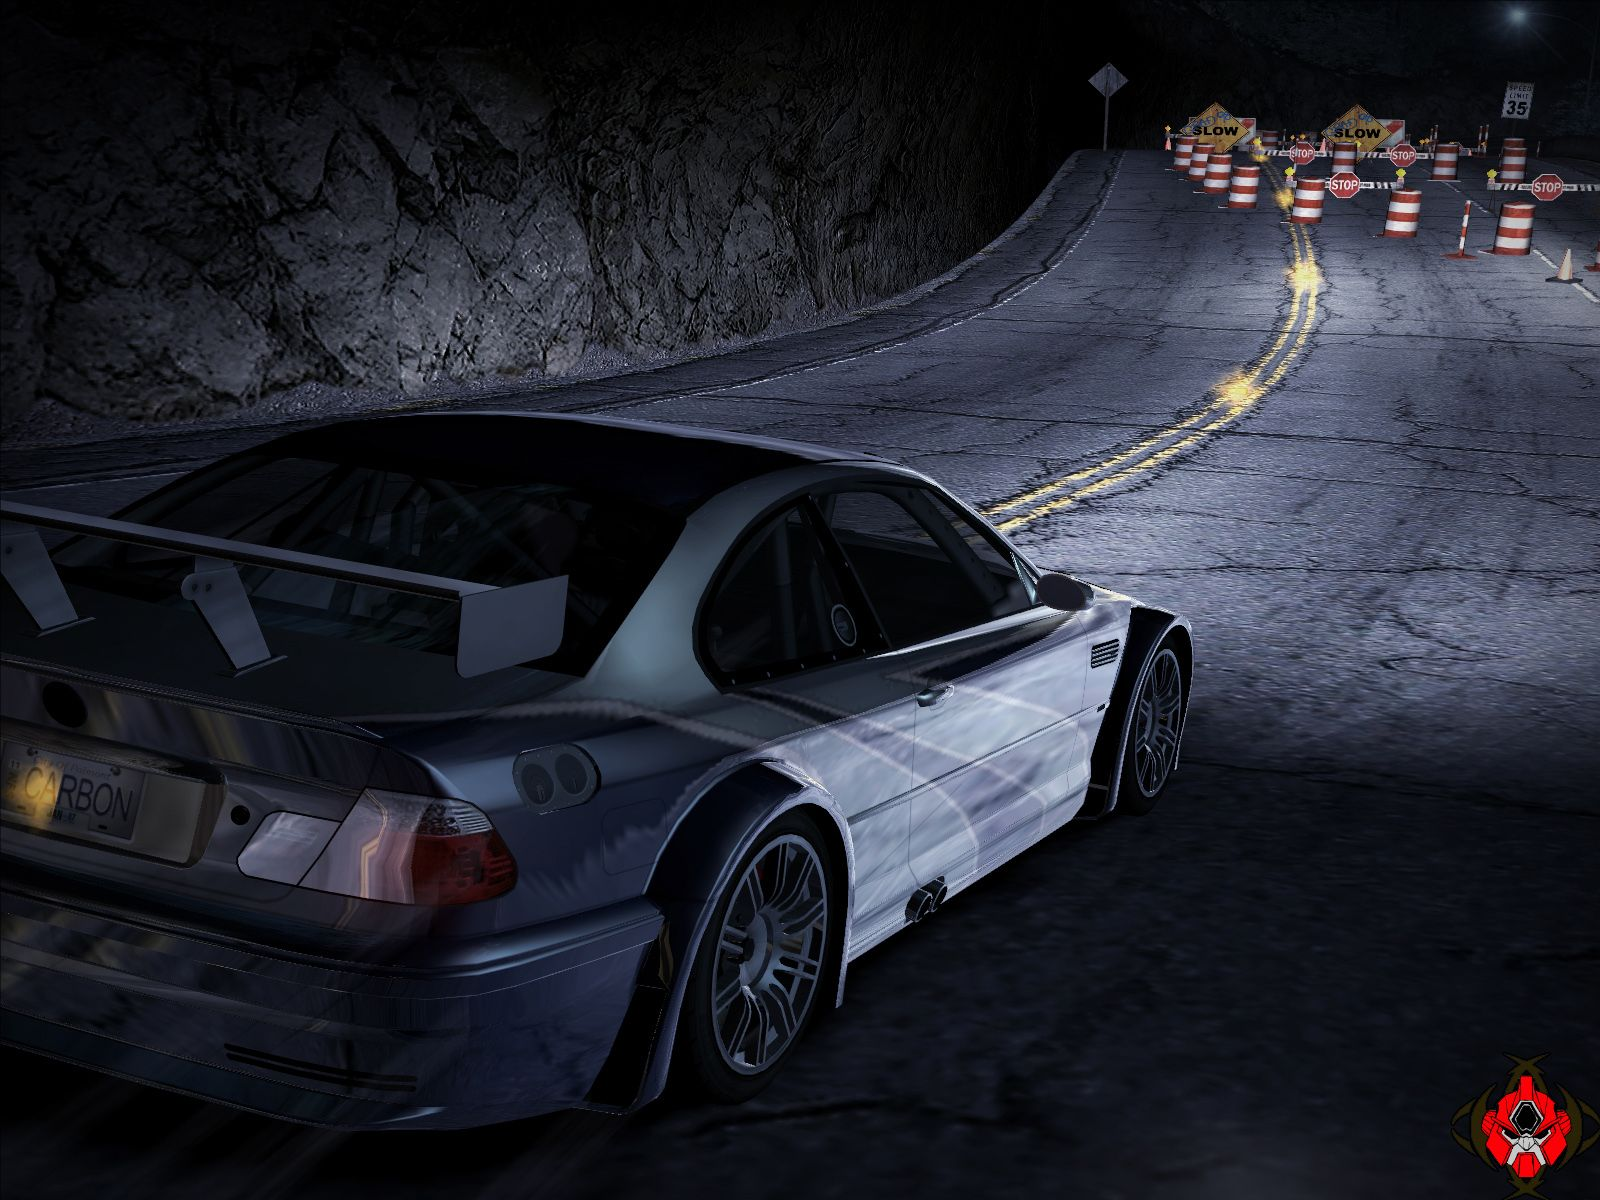 Bmw m3 gtr car wallpapers free download computer jpg 1600 1200